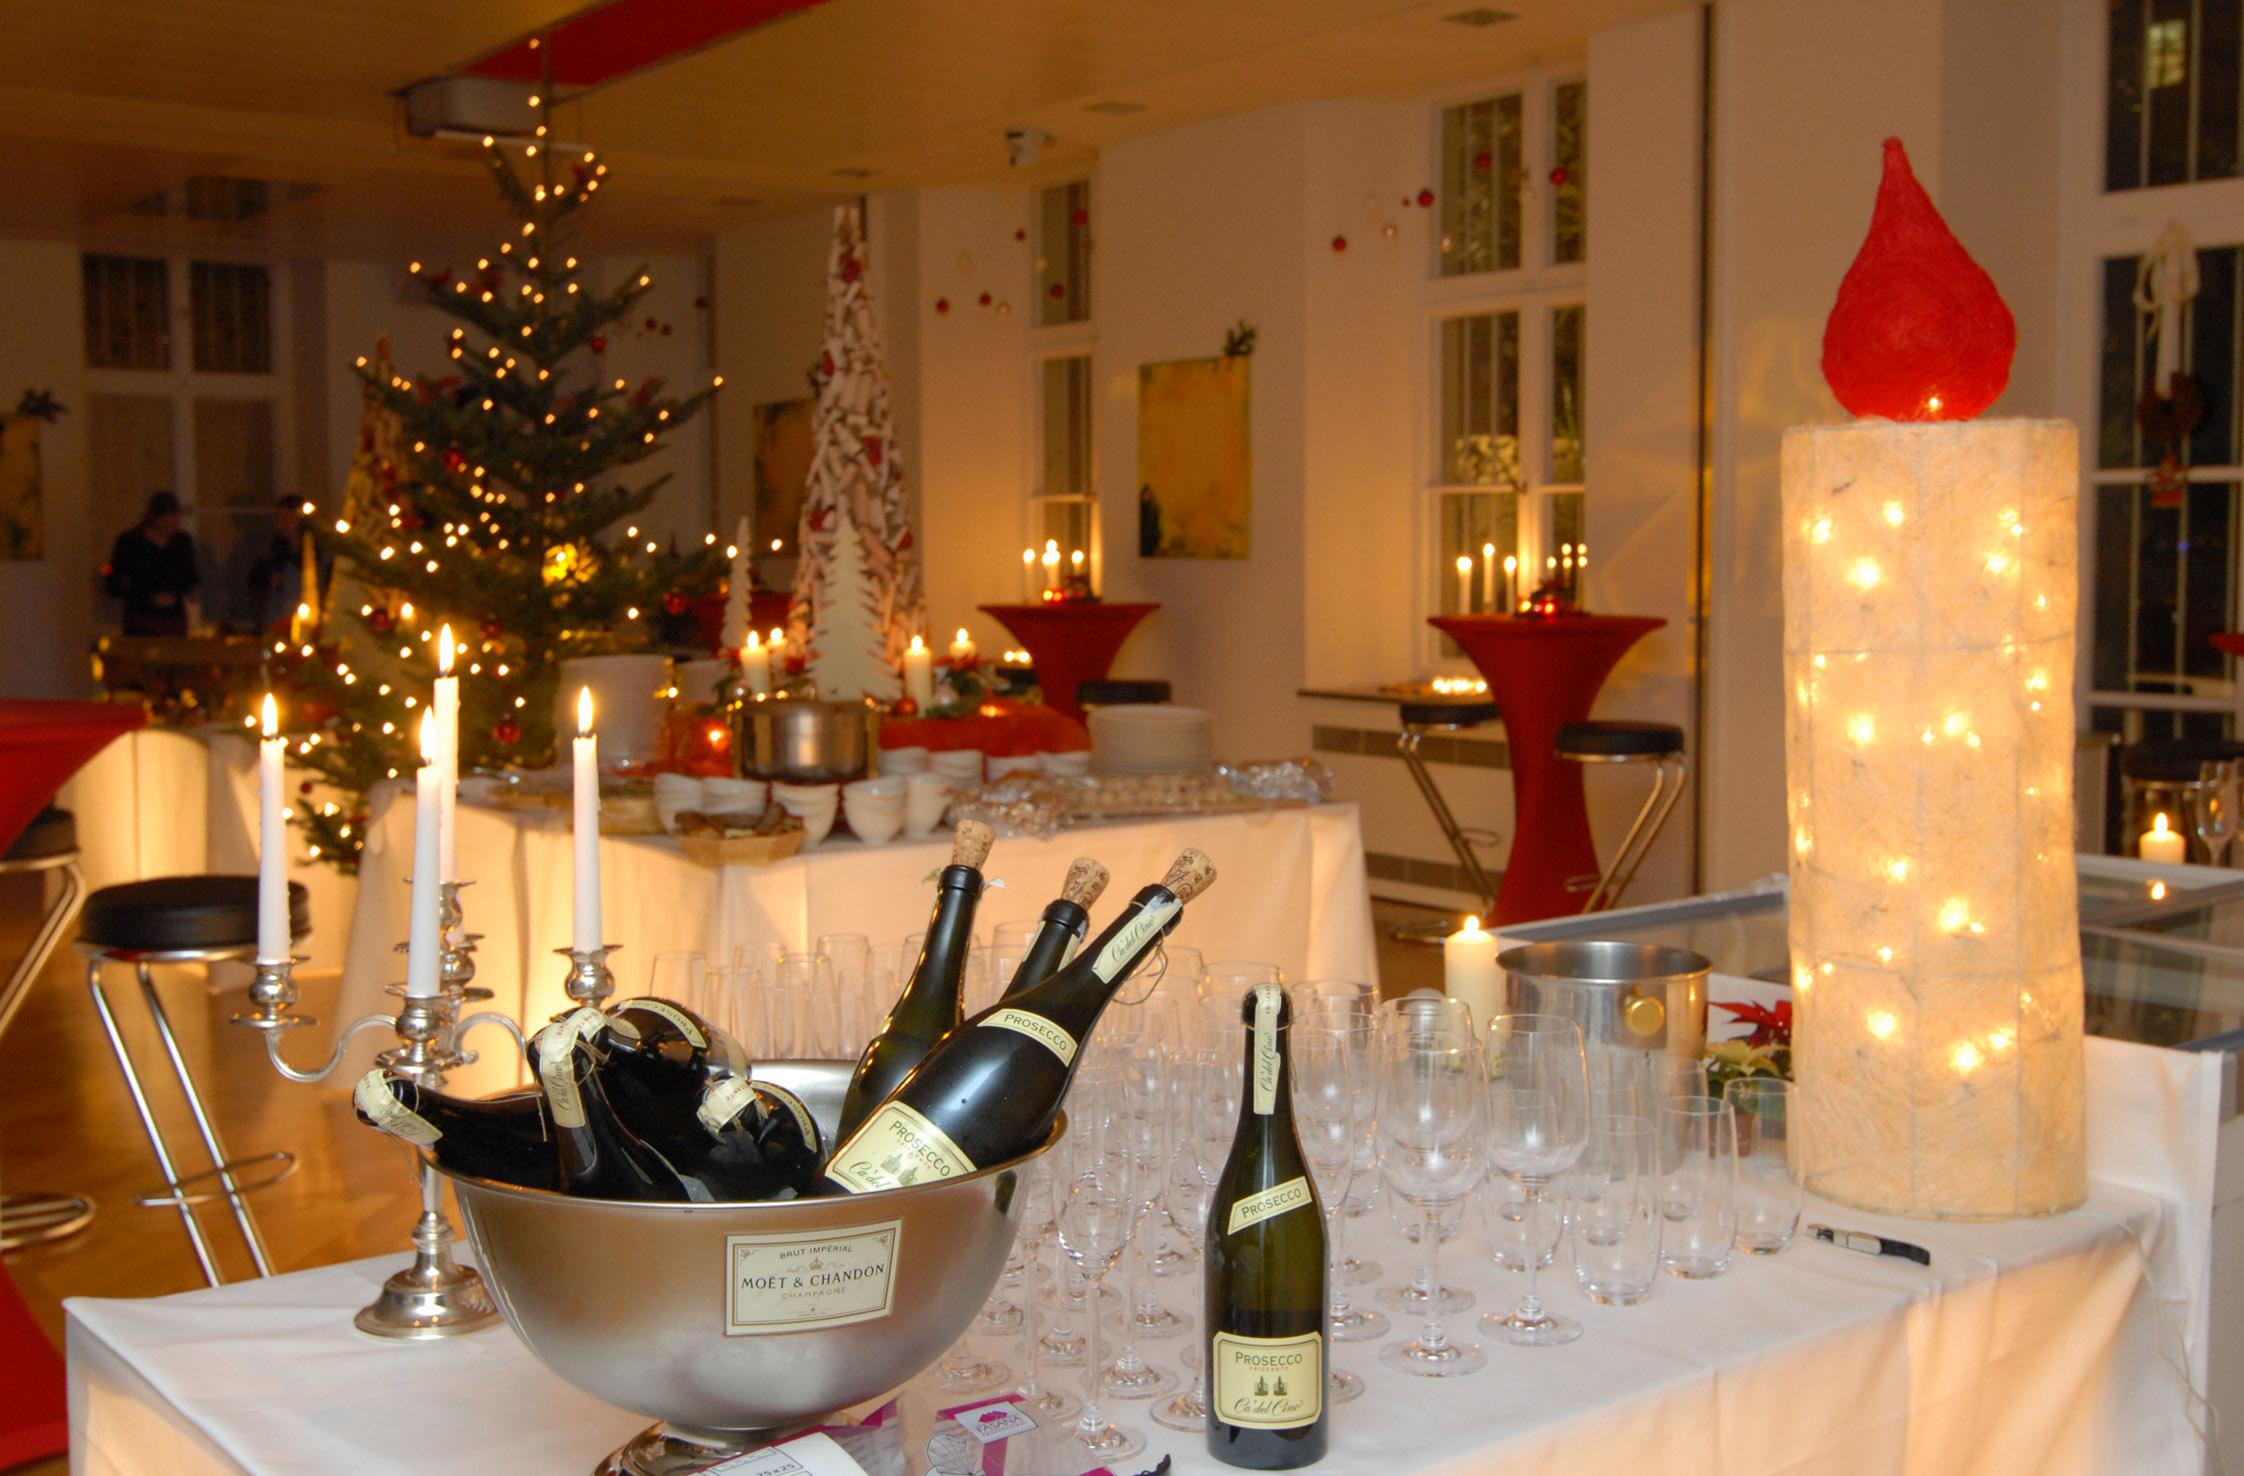 history of finance talk and christmas drinks - Christmas Blogs